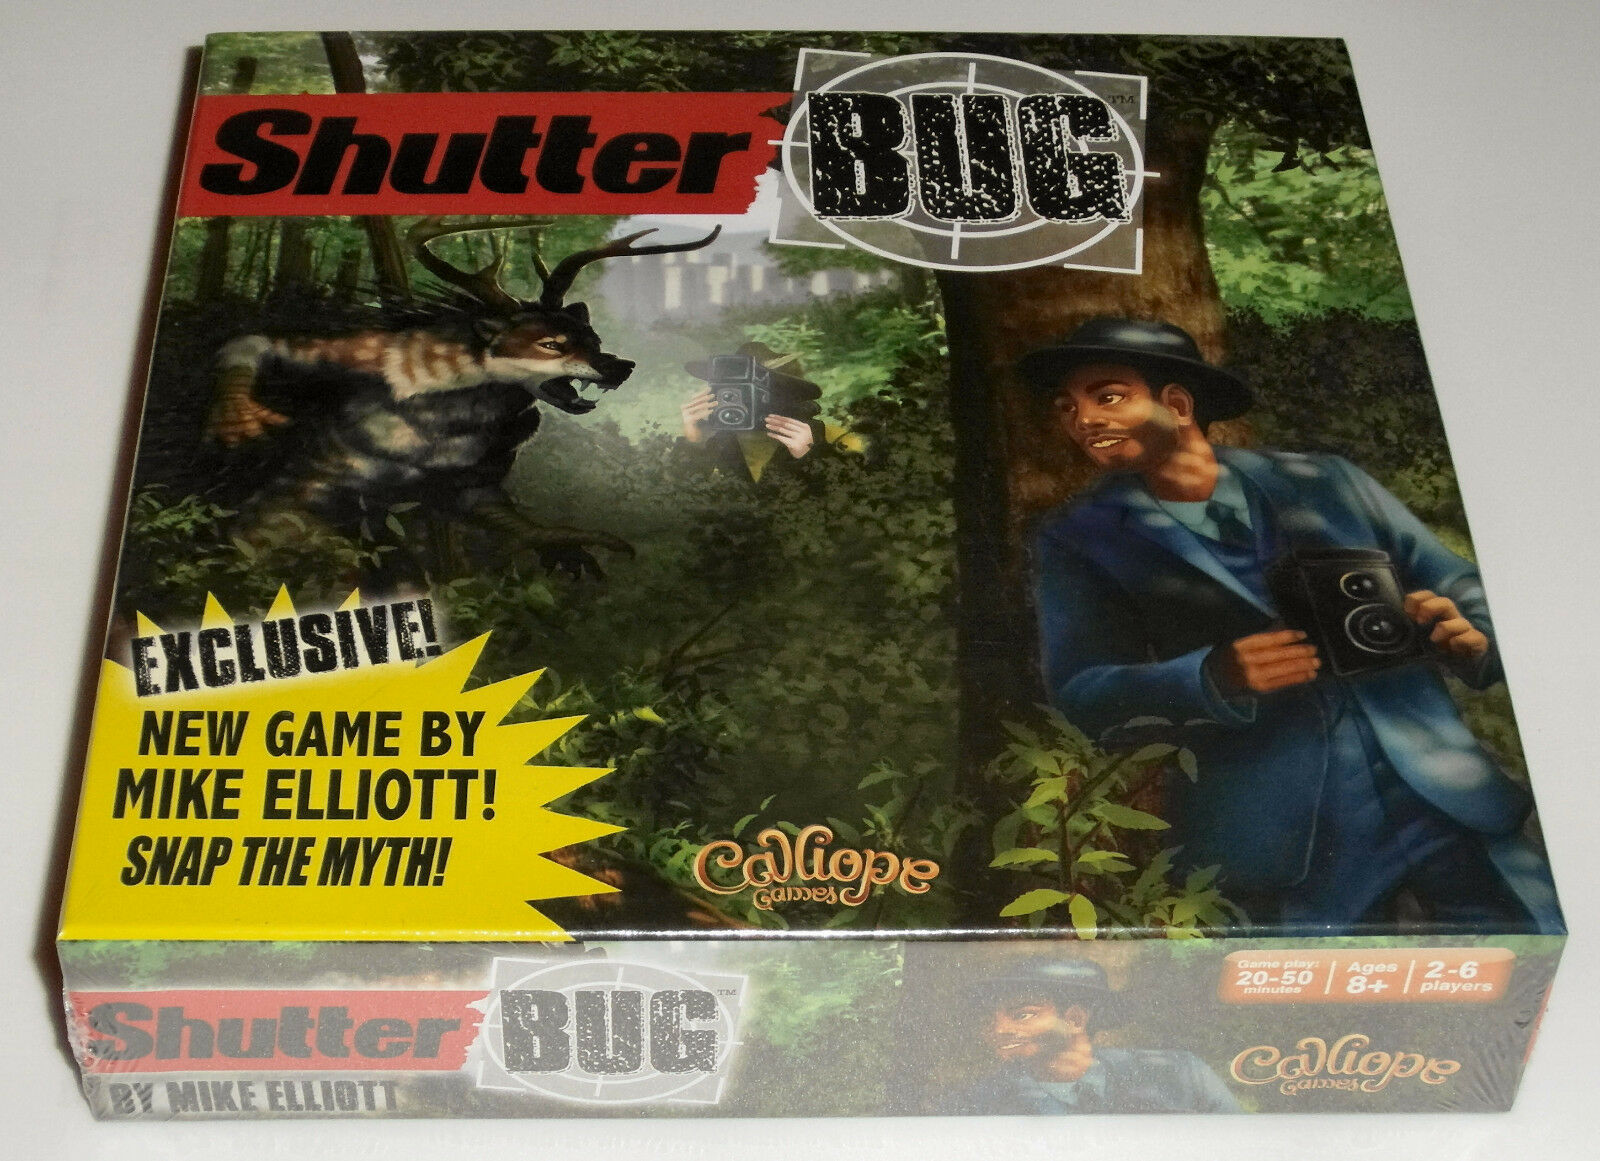 ShutterBug - Calliope Games - 2017